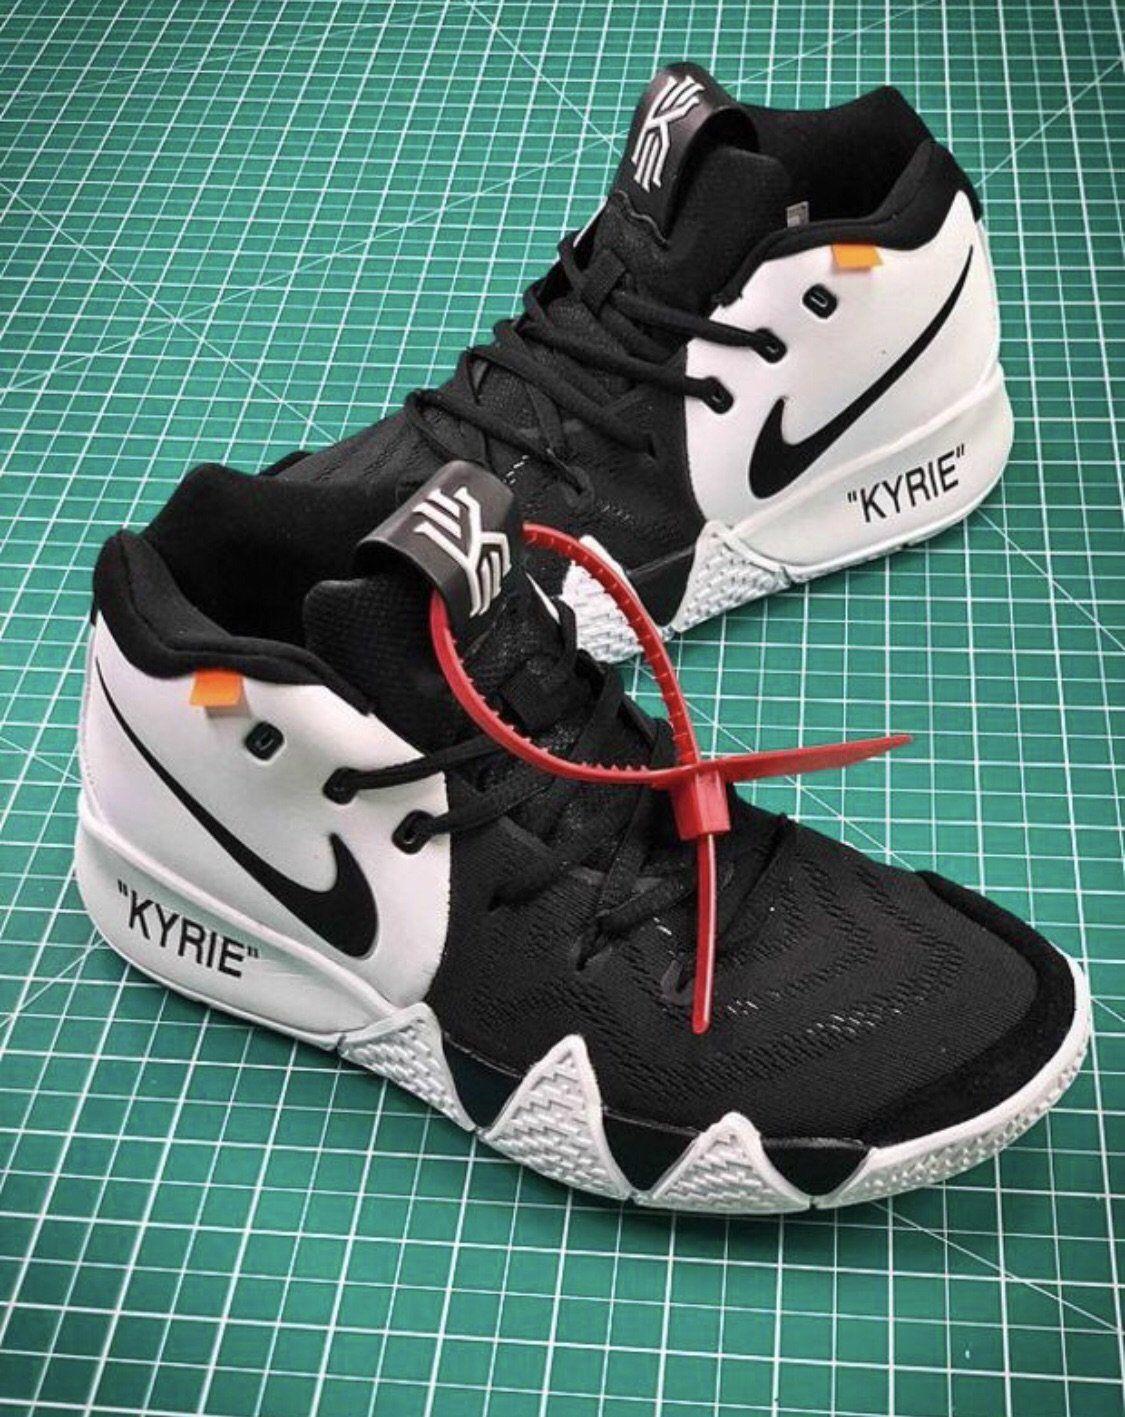 Off white X Nike kyrie 4 #sneaker